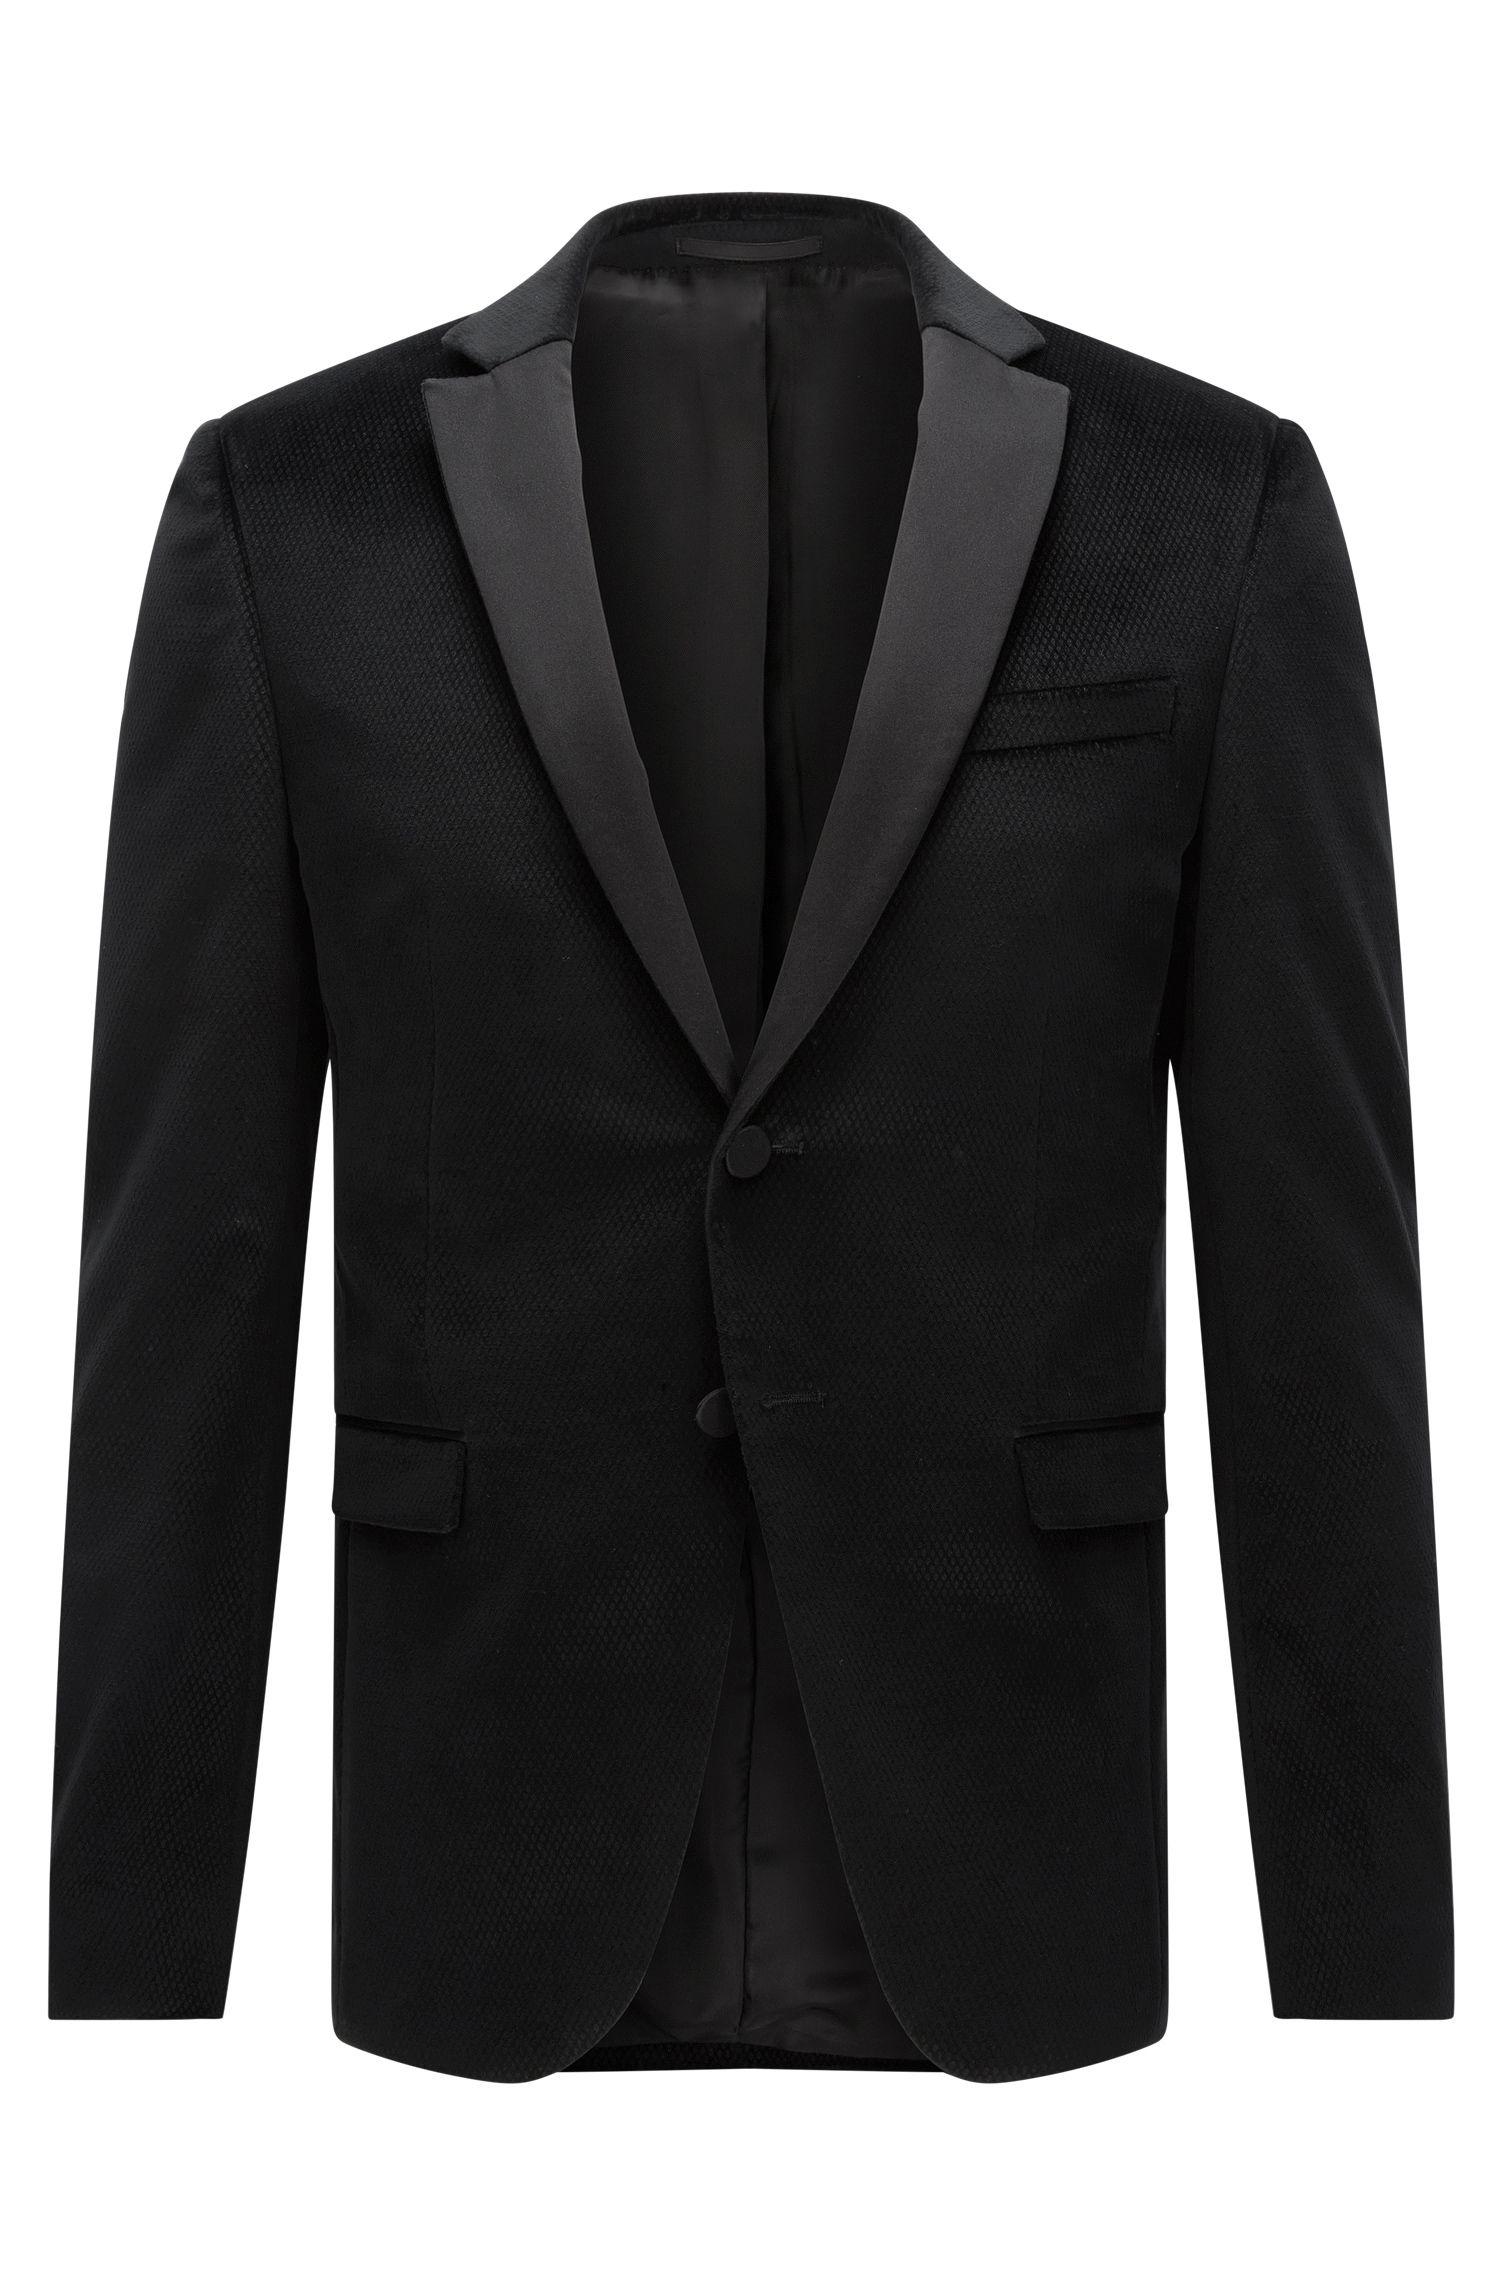 Diamond Cotton Dinner Jacket, Extra Slim Fit   Rainald